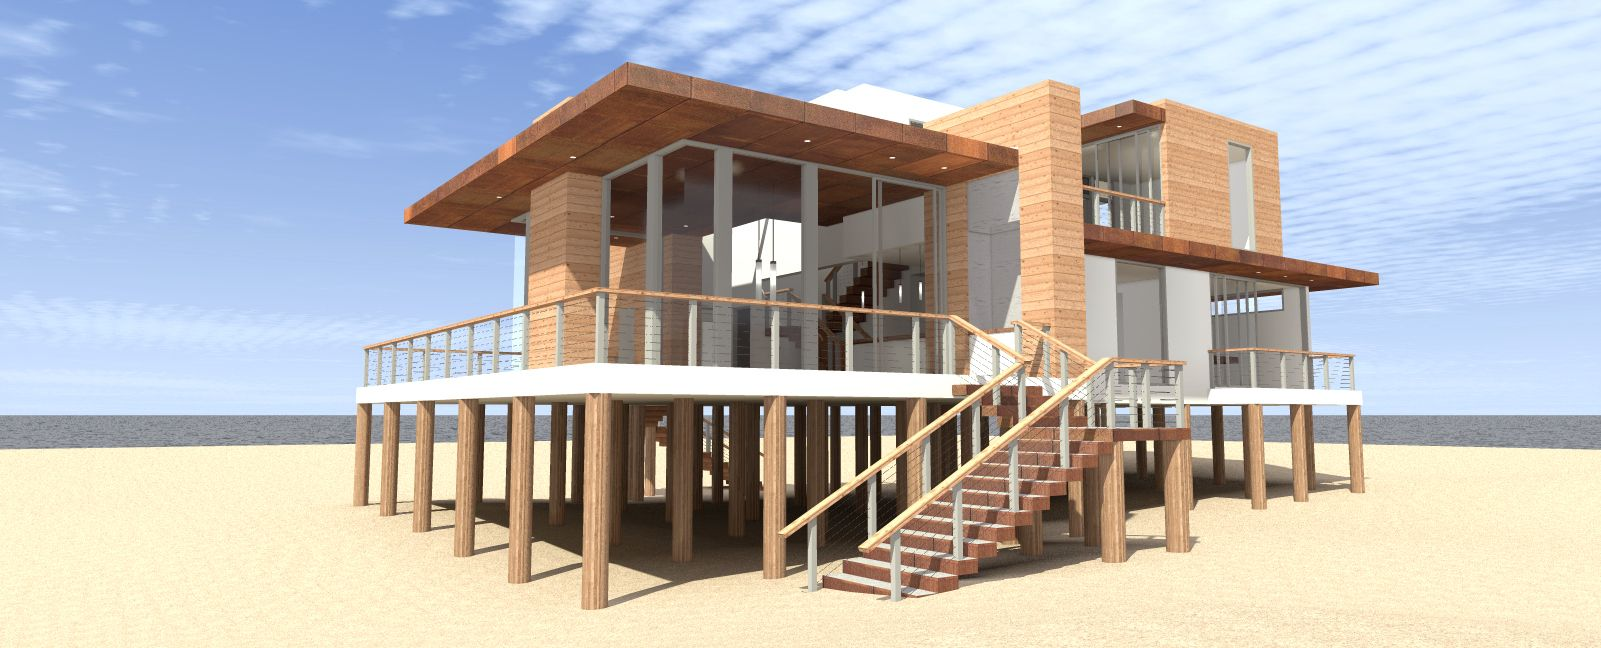 Niagara House Plan Tyree House Plans Beachfront House Beach House Plans Modern Beach House